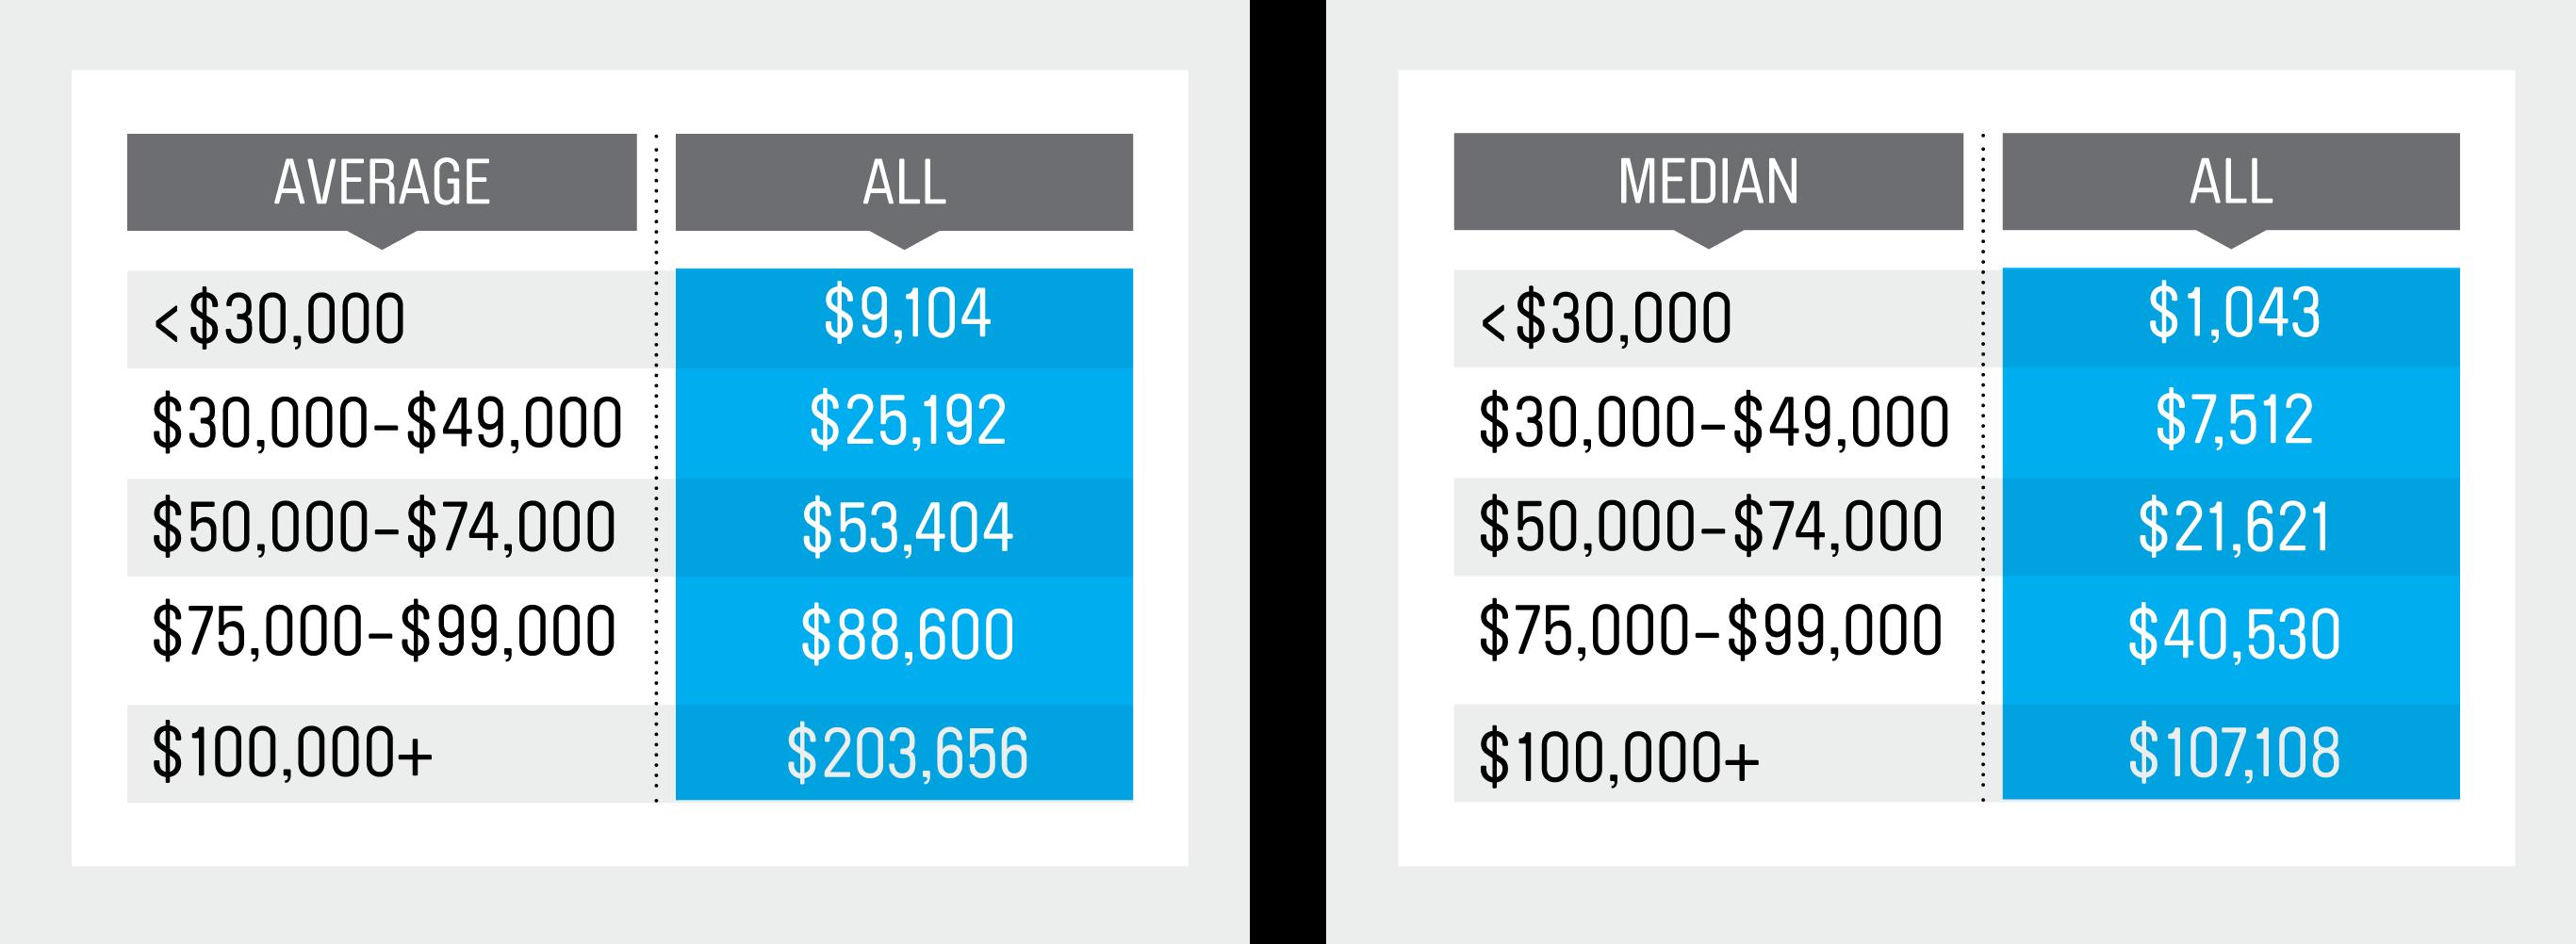 "Source: Vanguard, How America Saves 2016 (""How America Saves 2016"")"